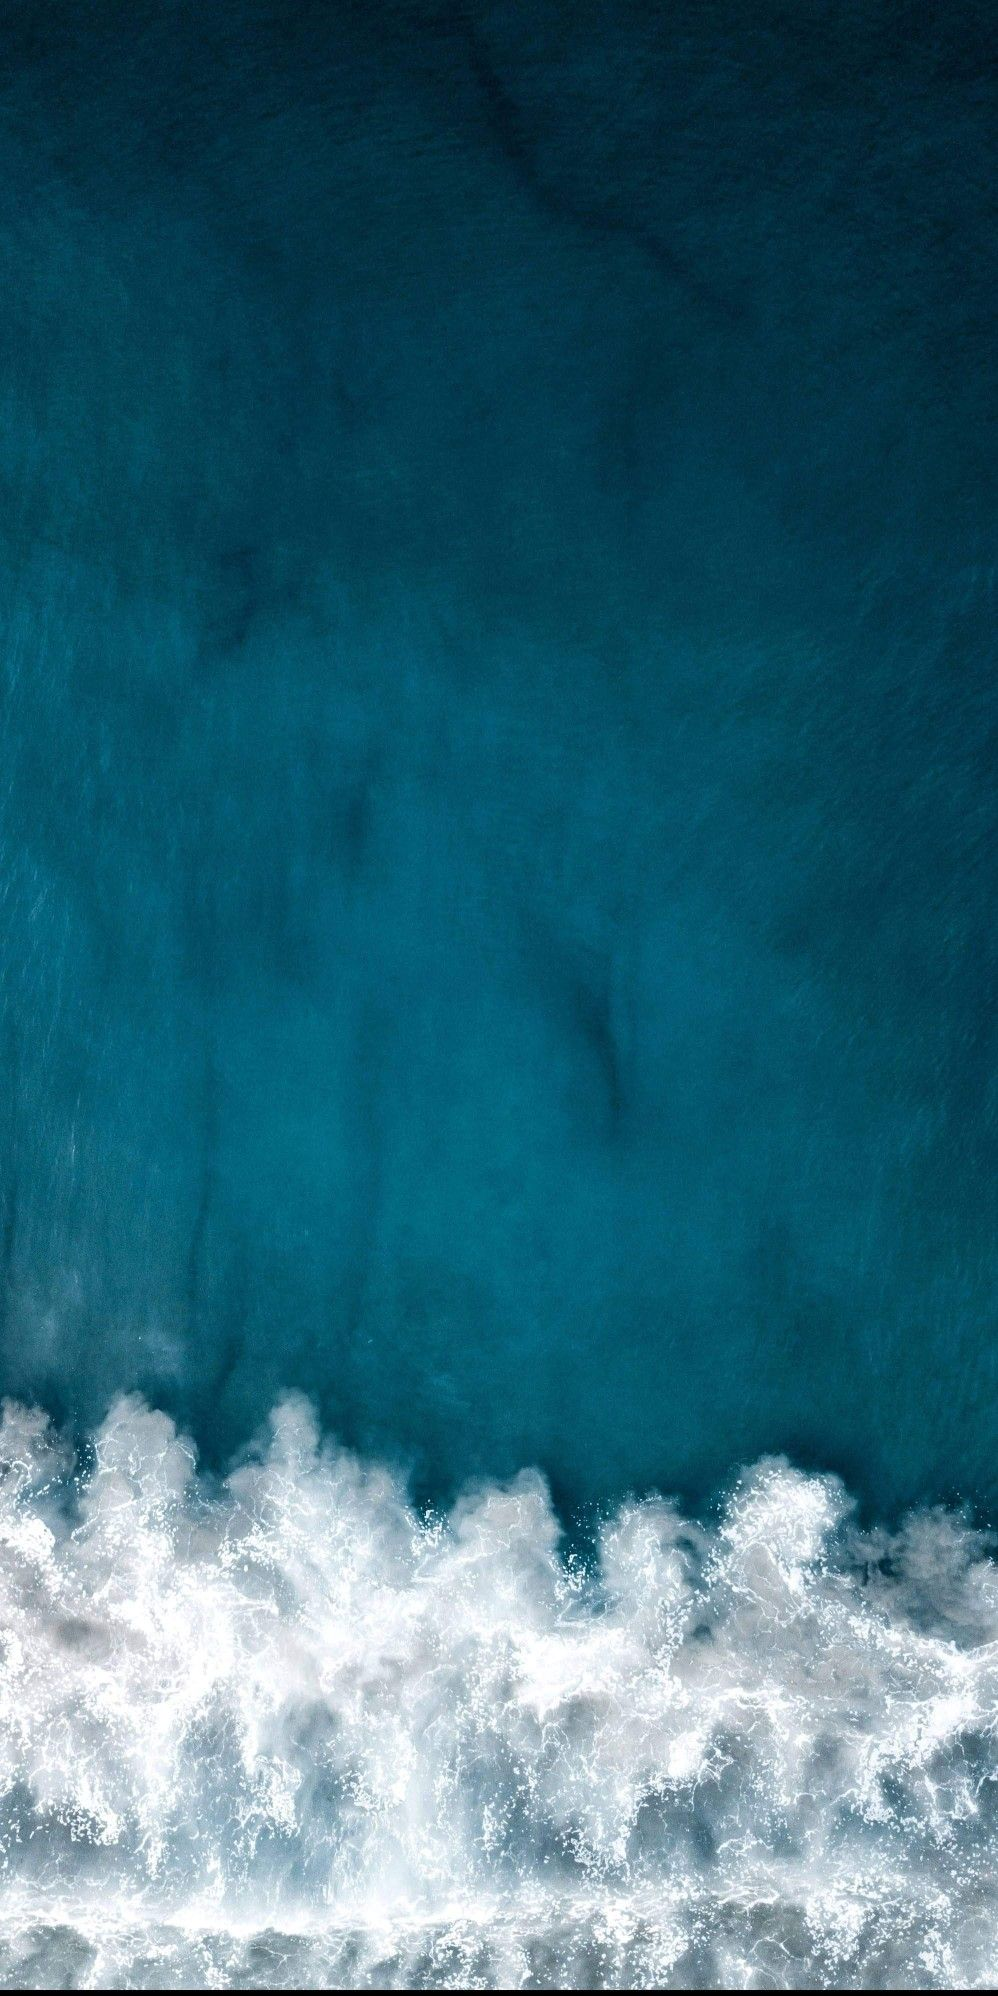 Drone Photography Ocean Sea View Ocean Wallpaper Wallpaper Images Hd Google Pixel Wallpaper